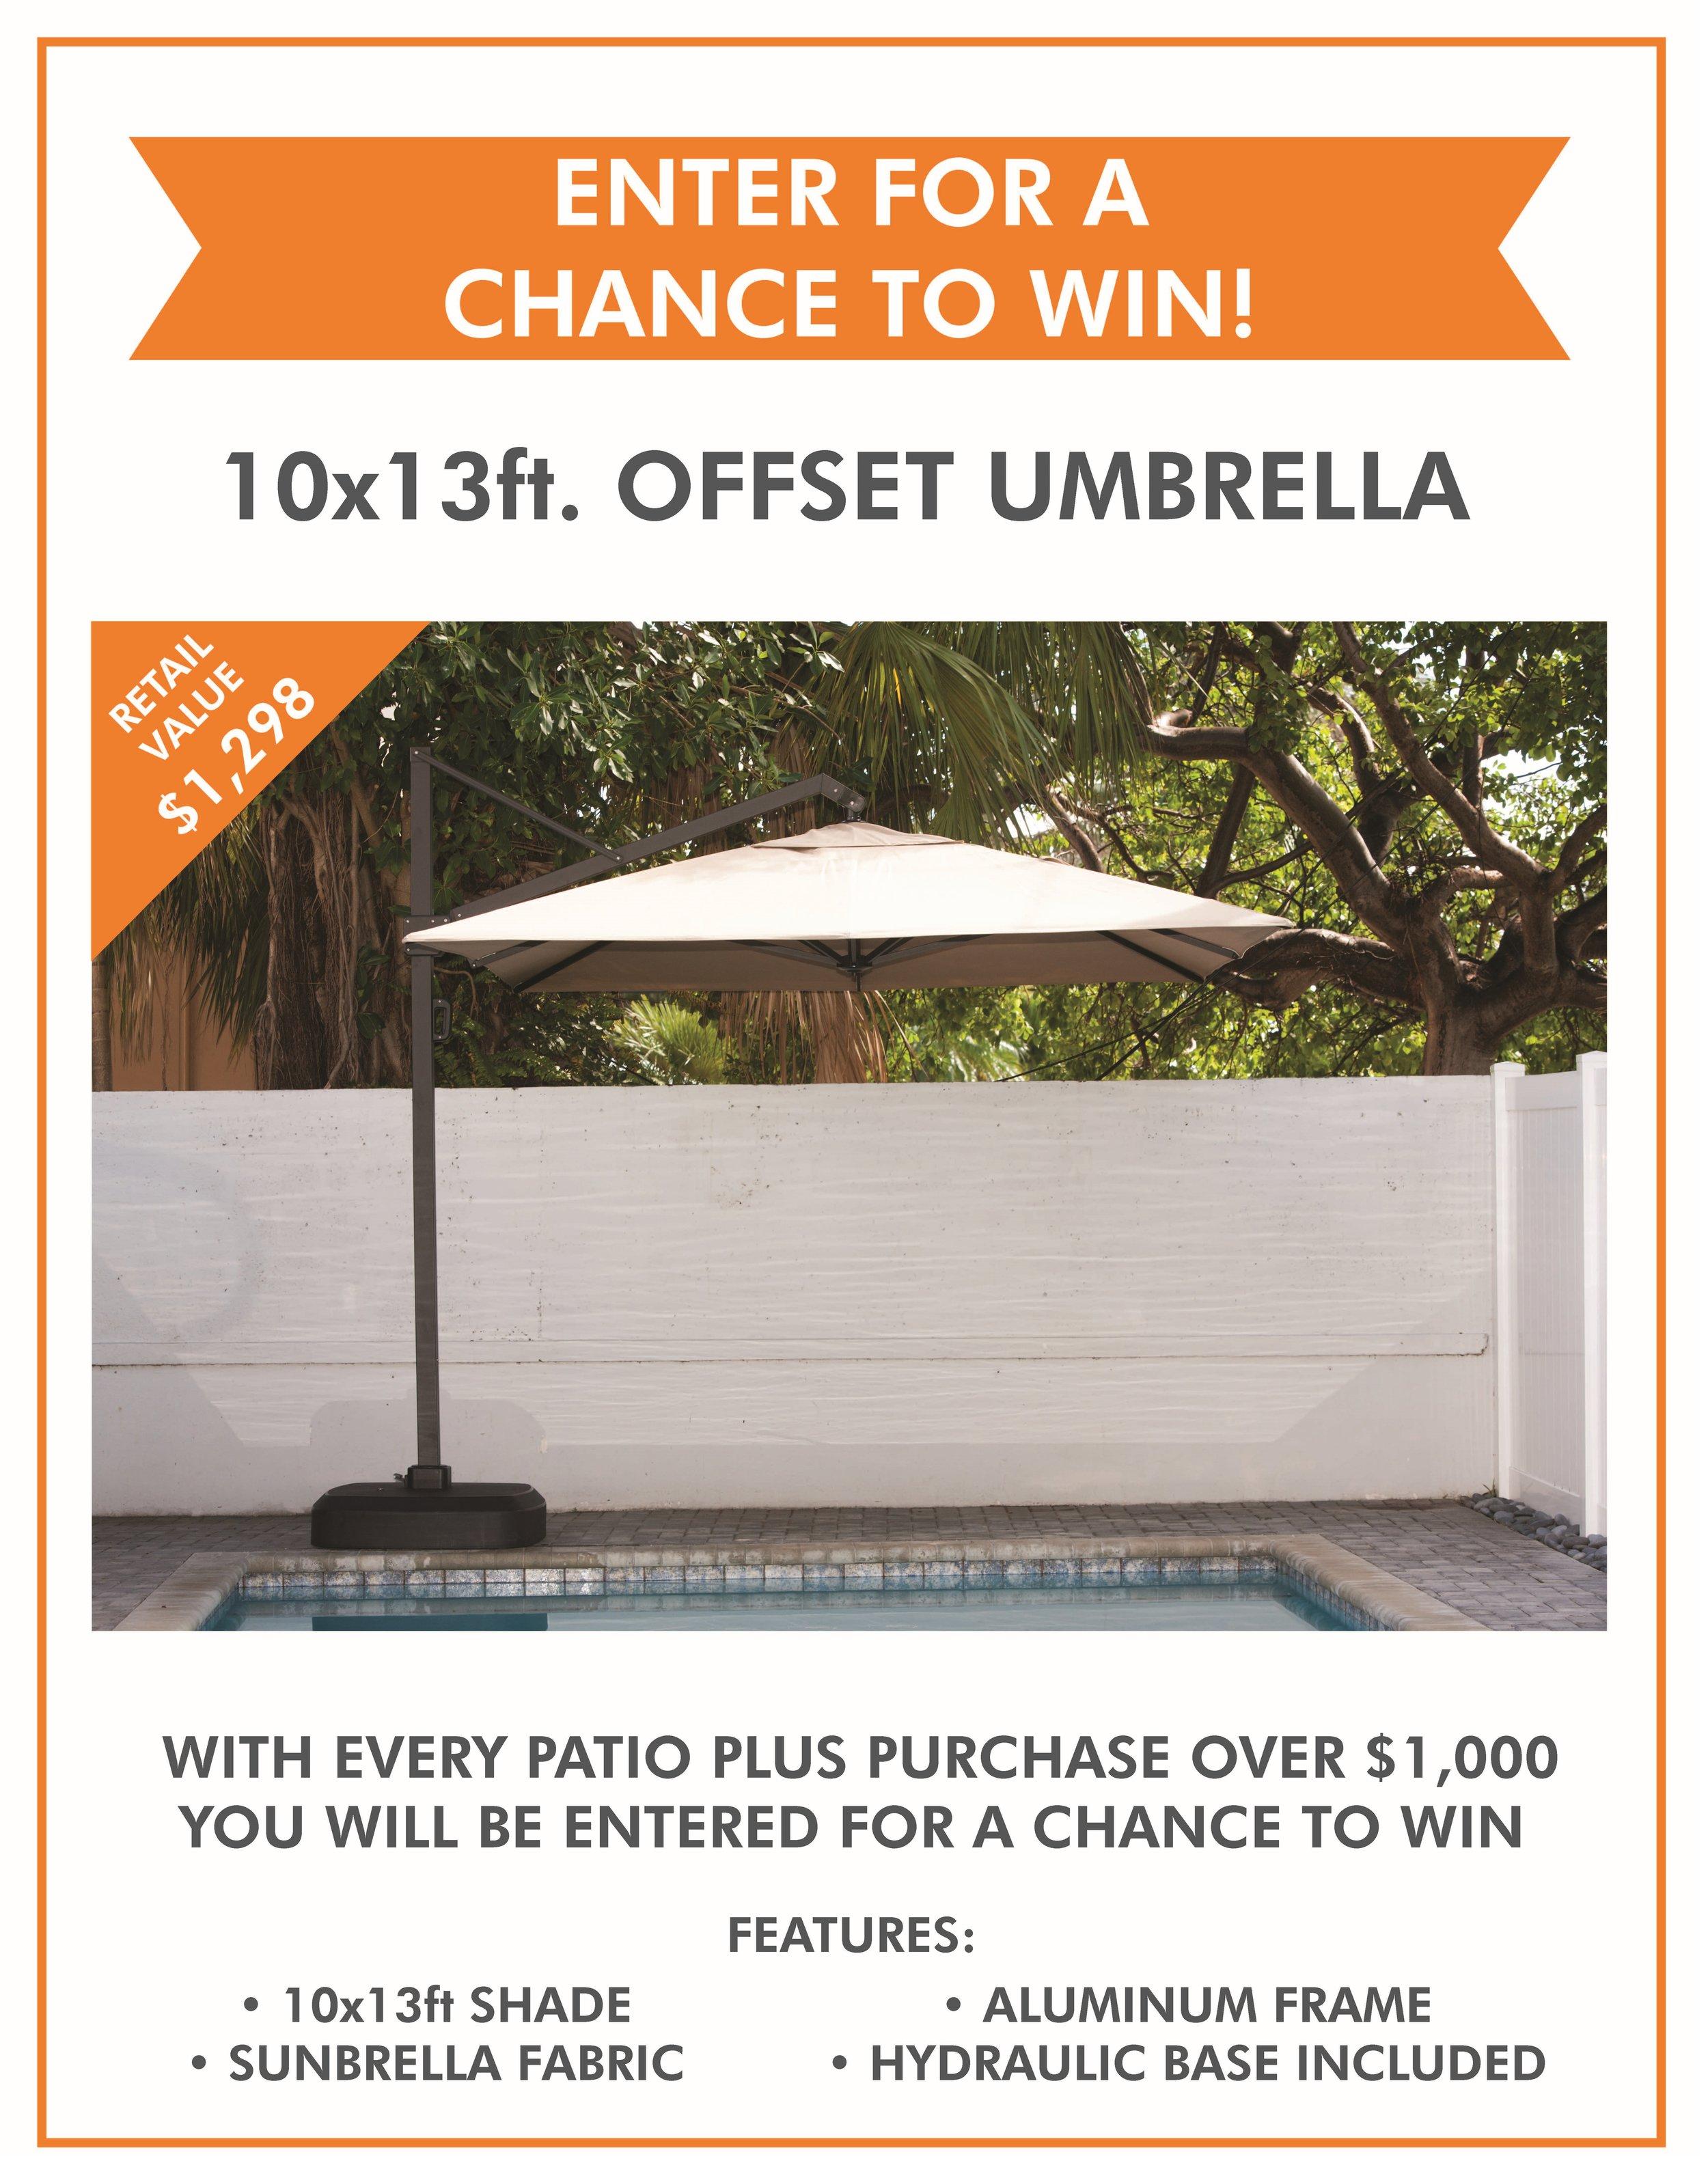 Umbrella give away 20x30 insta.jpg